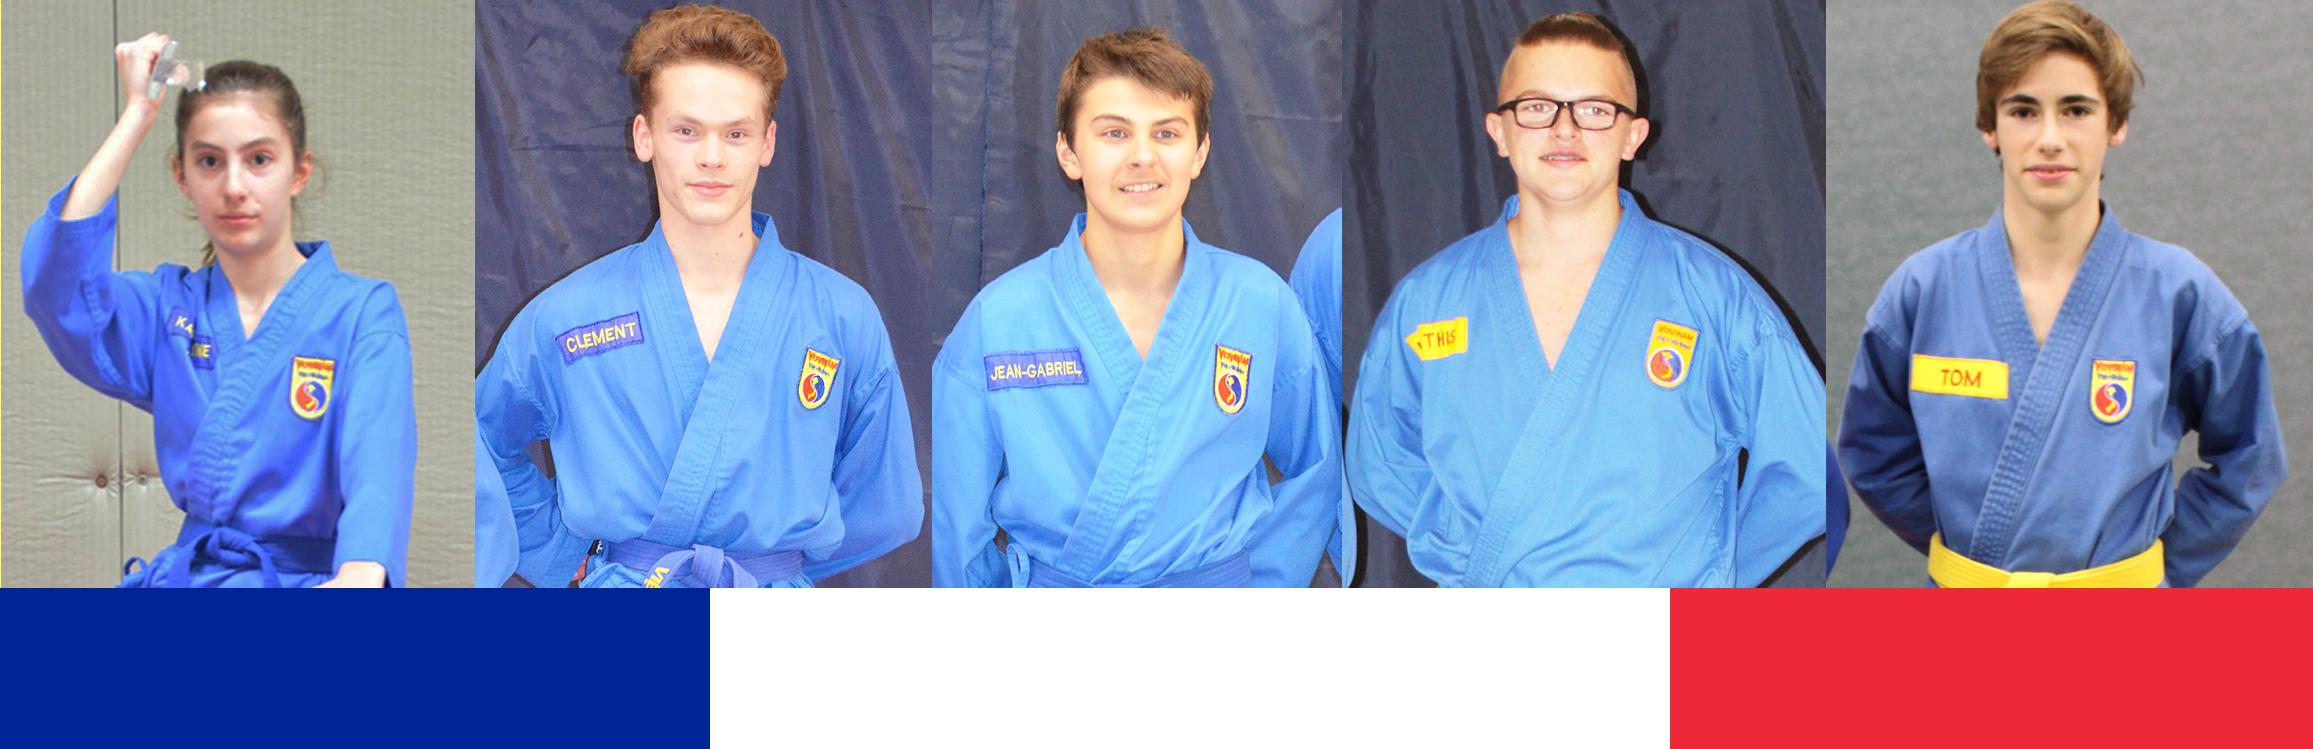 Team-europe